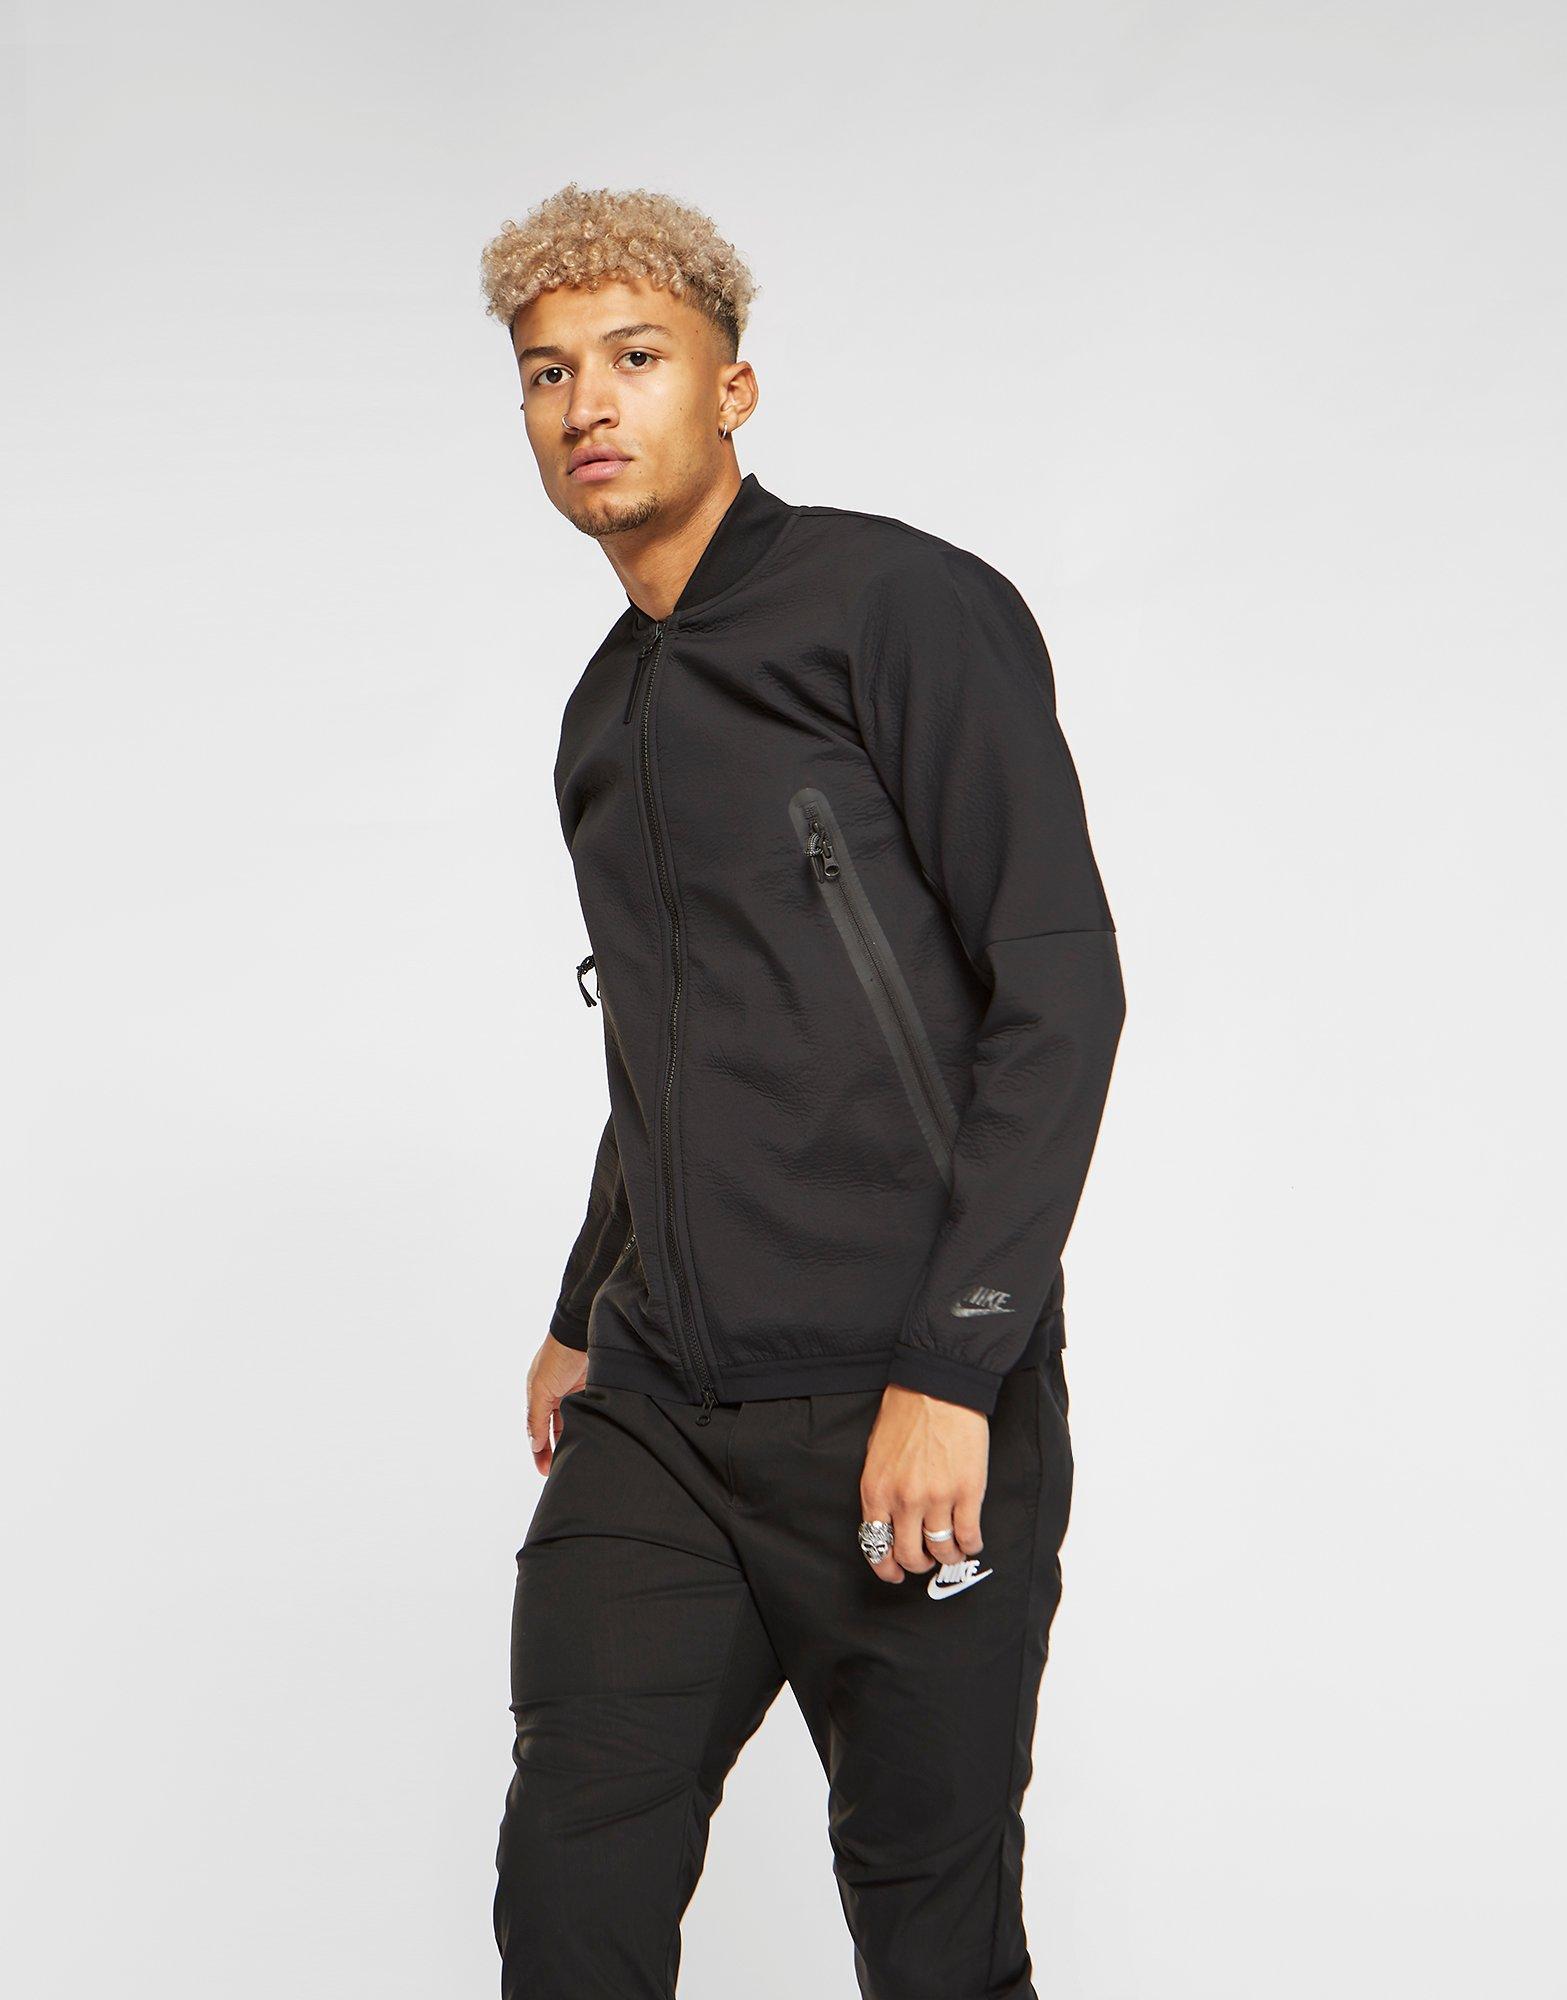 af31db3608a0 Lyst - Nike Tech Woven Jacket in Black for Men